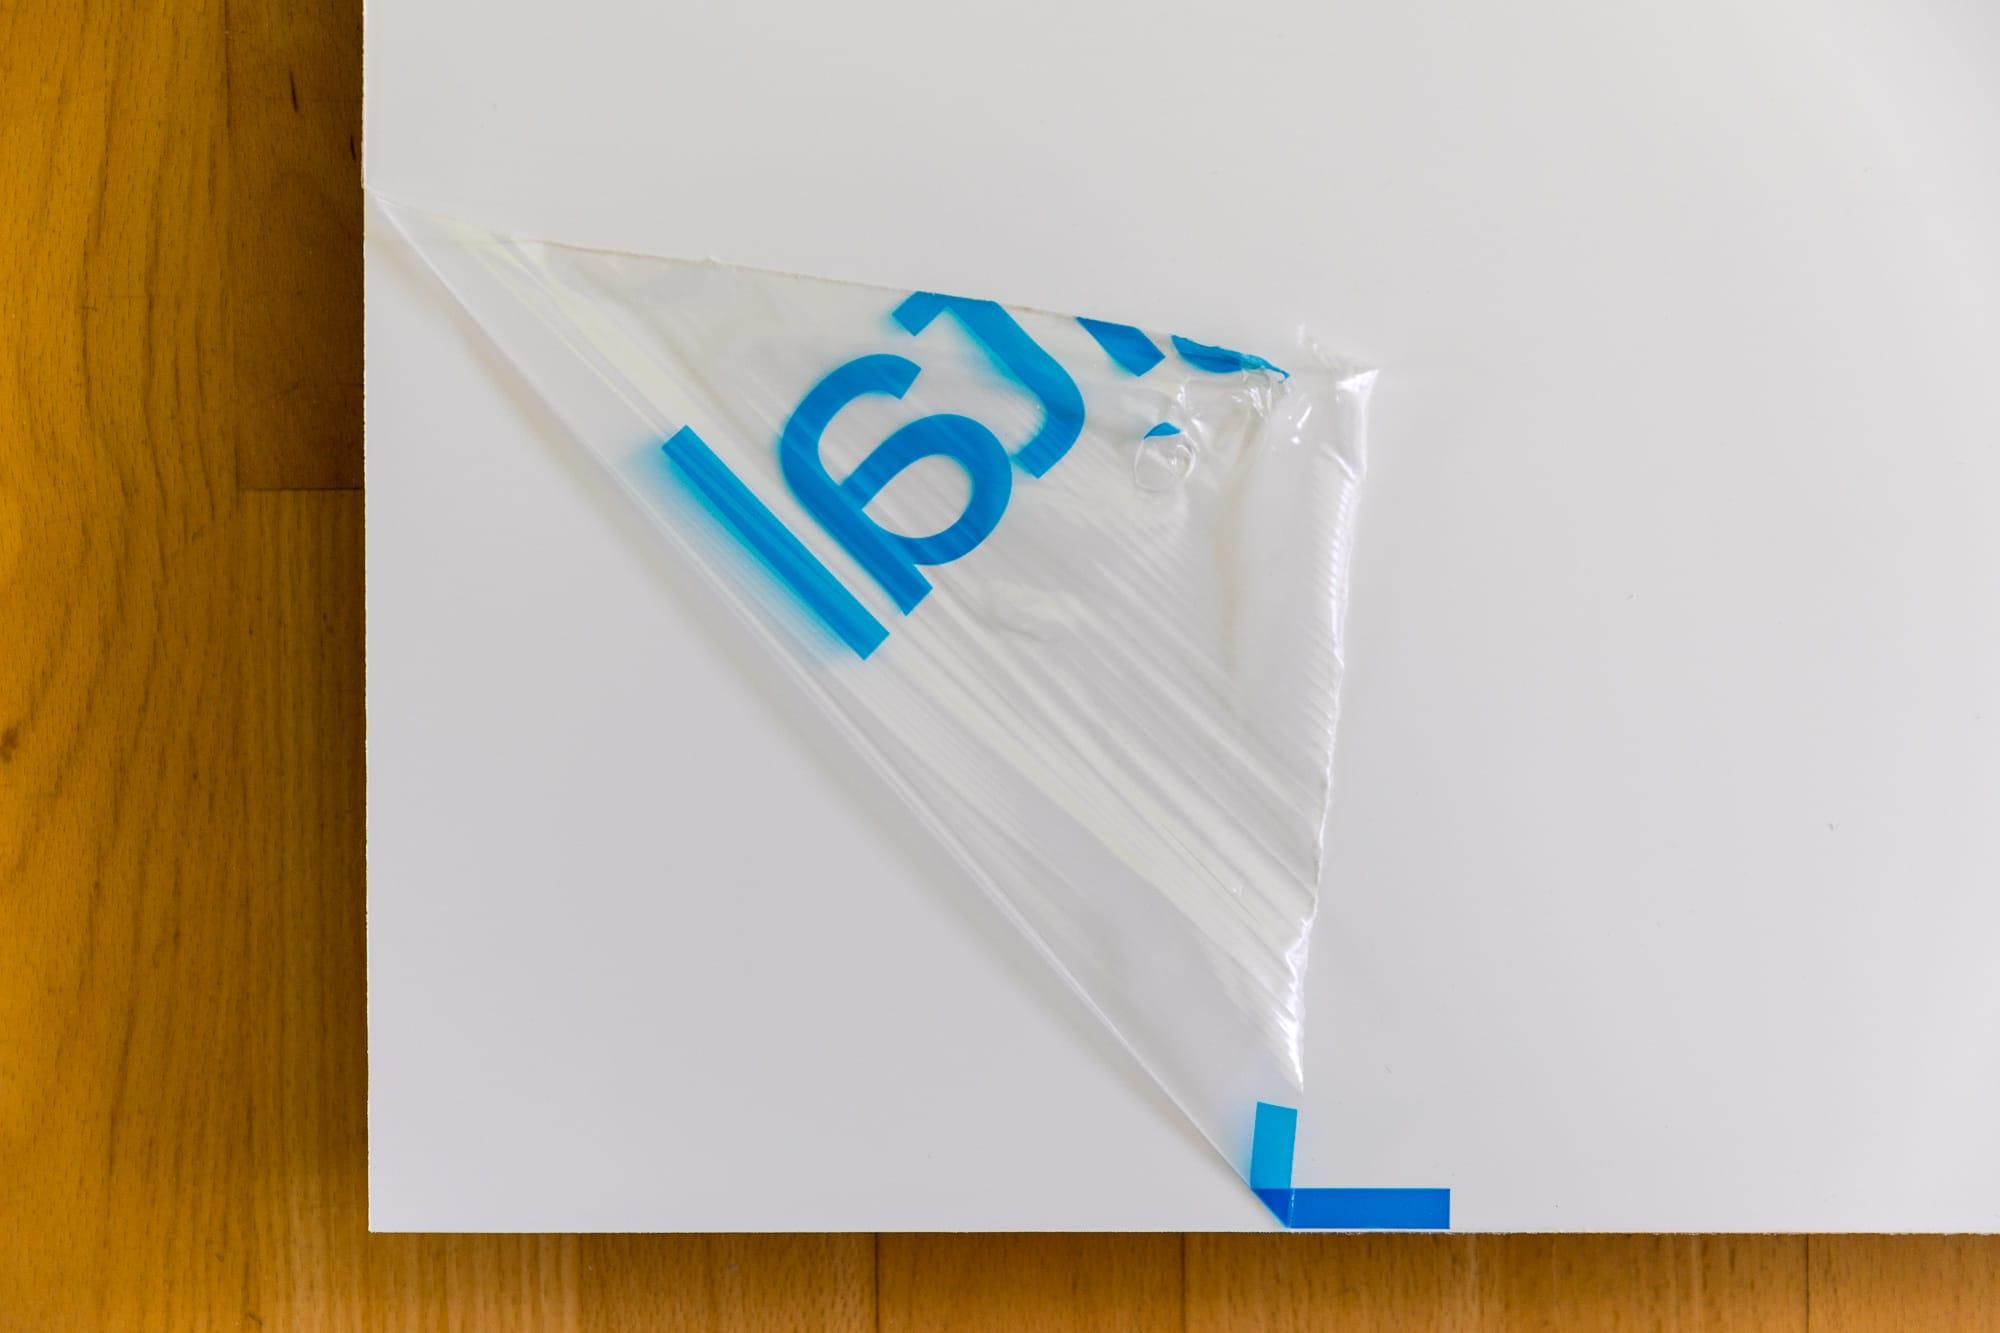 querformat-fotografie - Achim Katzberg - querformat-fotografie_ZOR_Produkt_Test-006